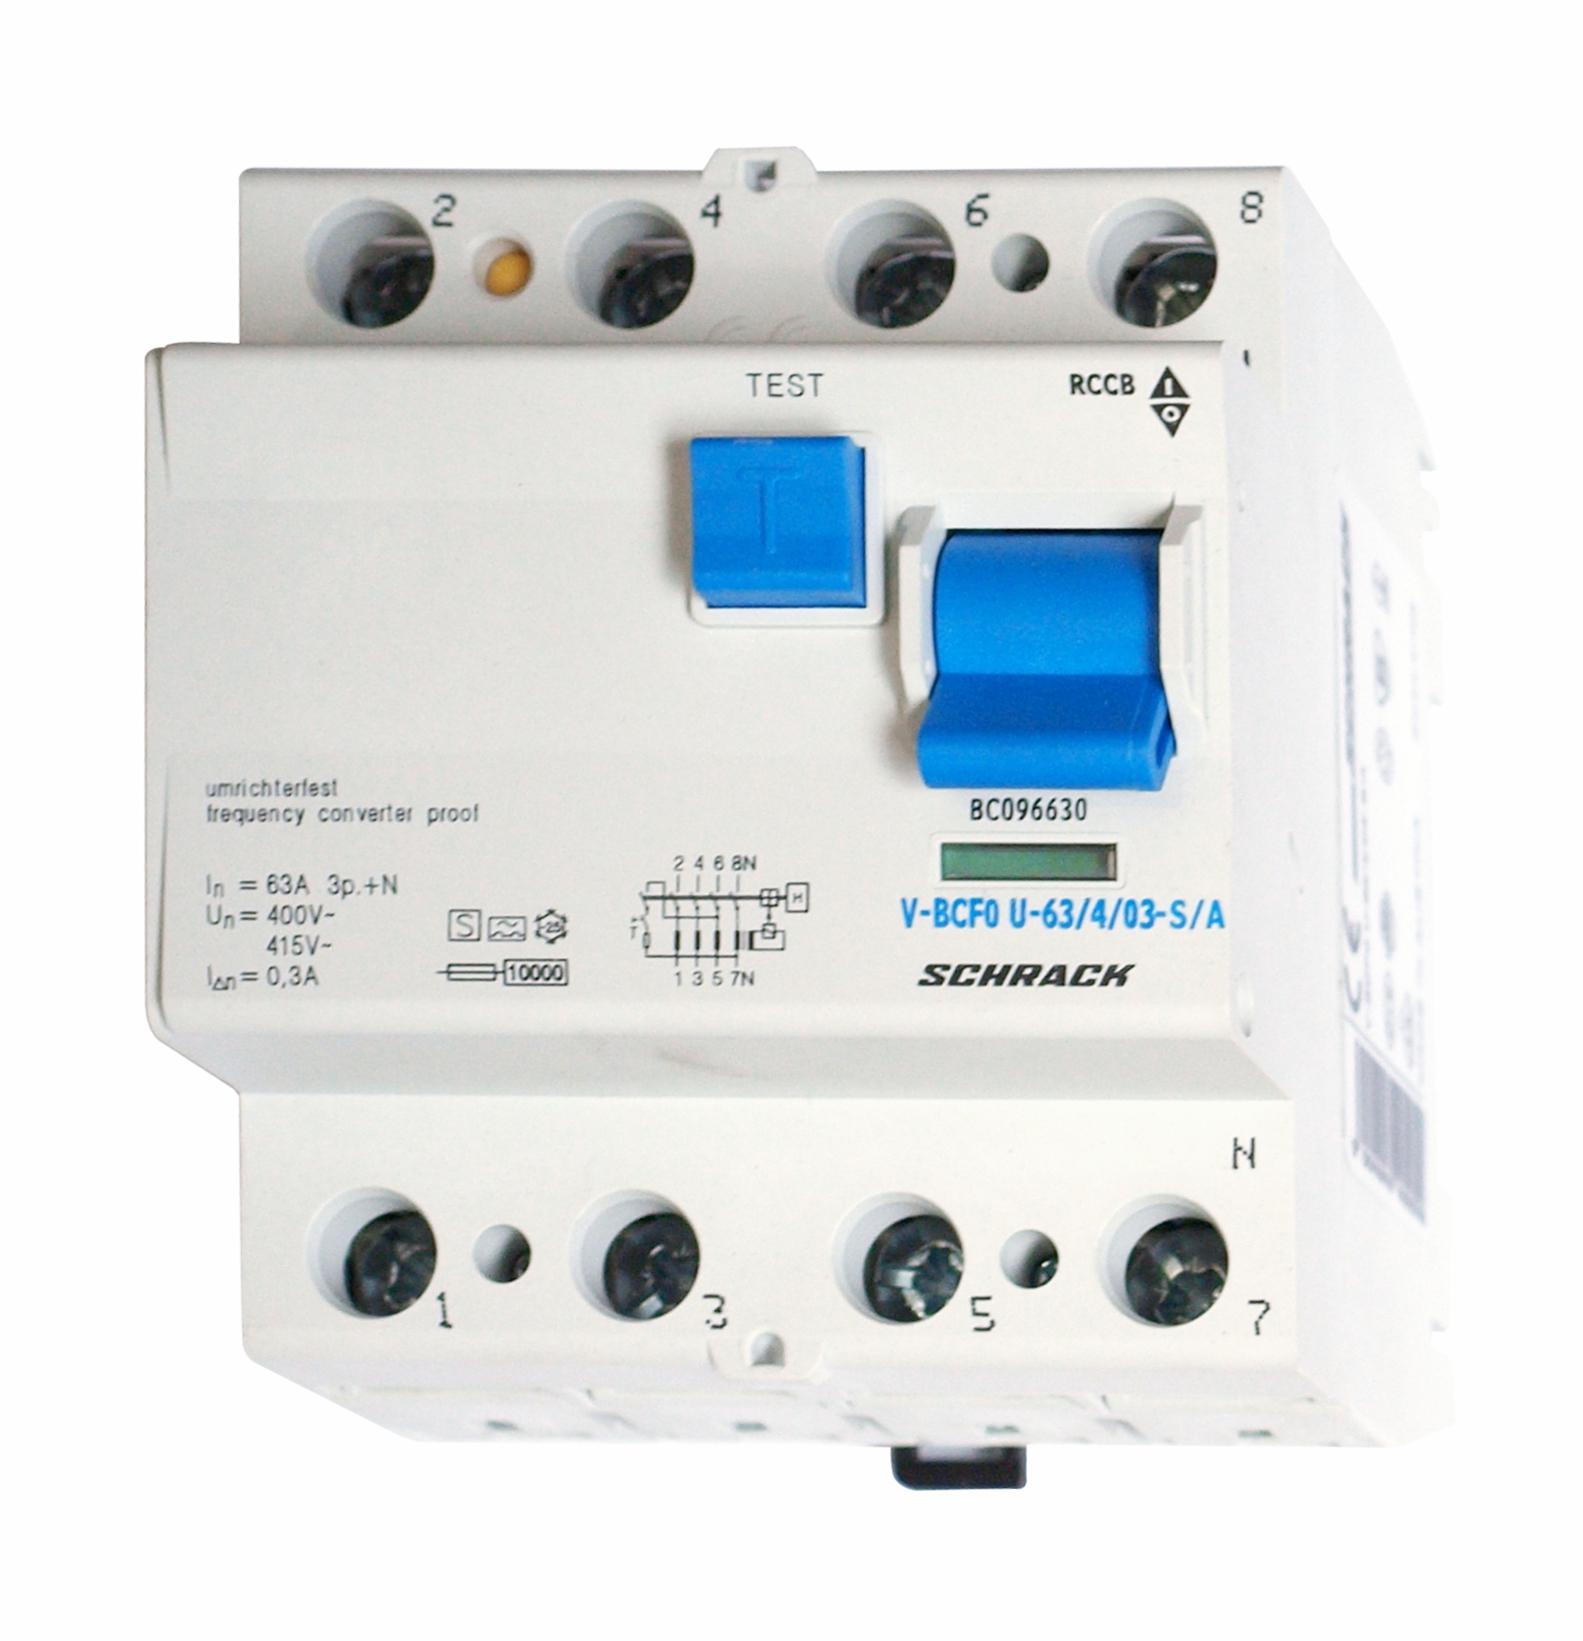 1 Stk FI-Schalter, FU fest, 63A, 4-polig, 300mA, vsf., S, Typ A BC096630--